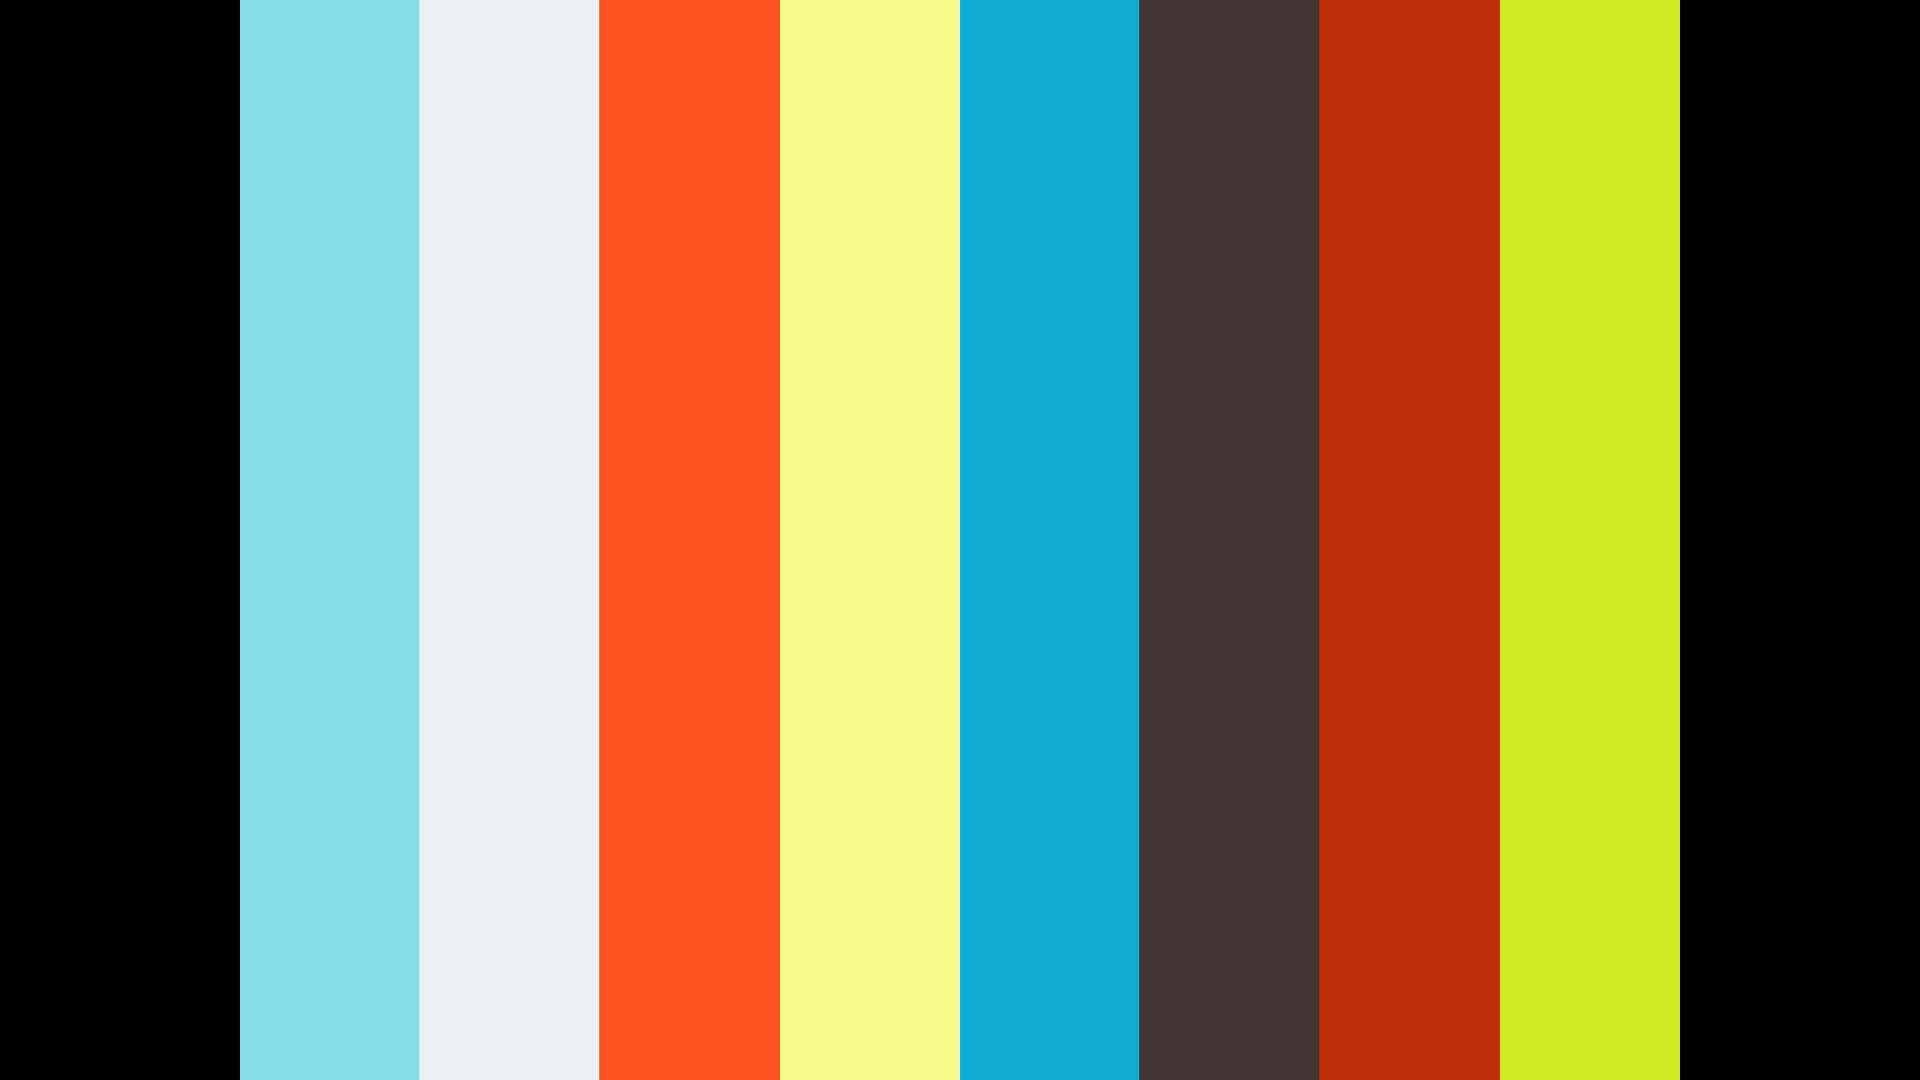 LIVE 15 MARS - CIRCUIT CARDIO - GWEN